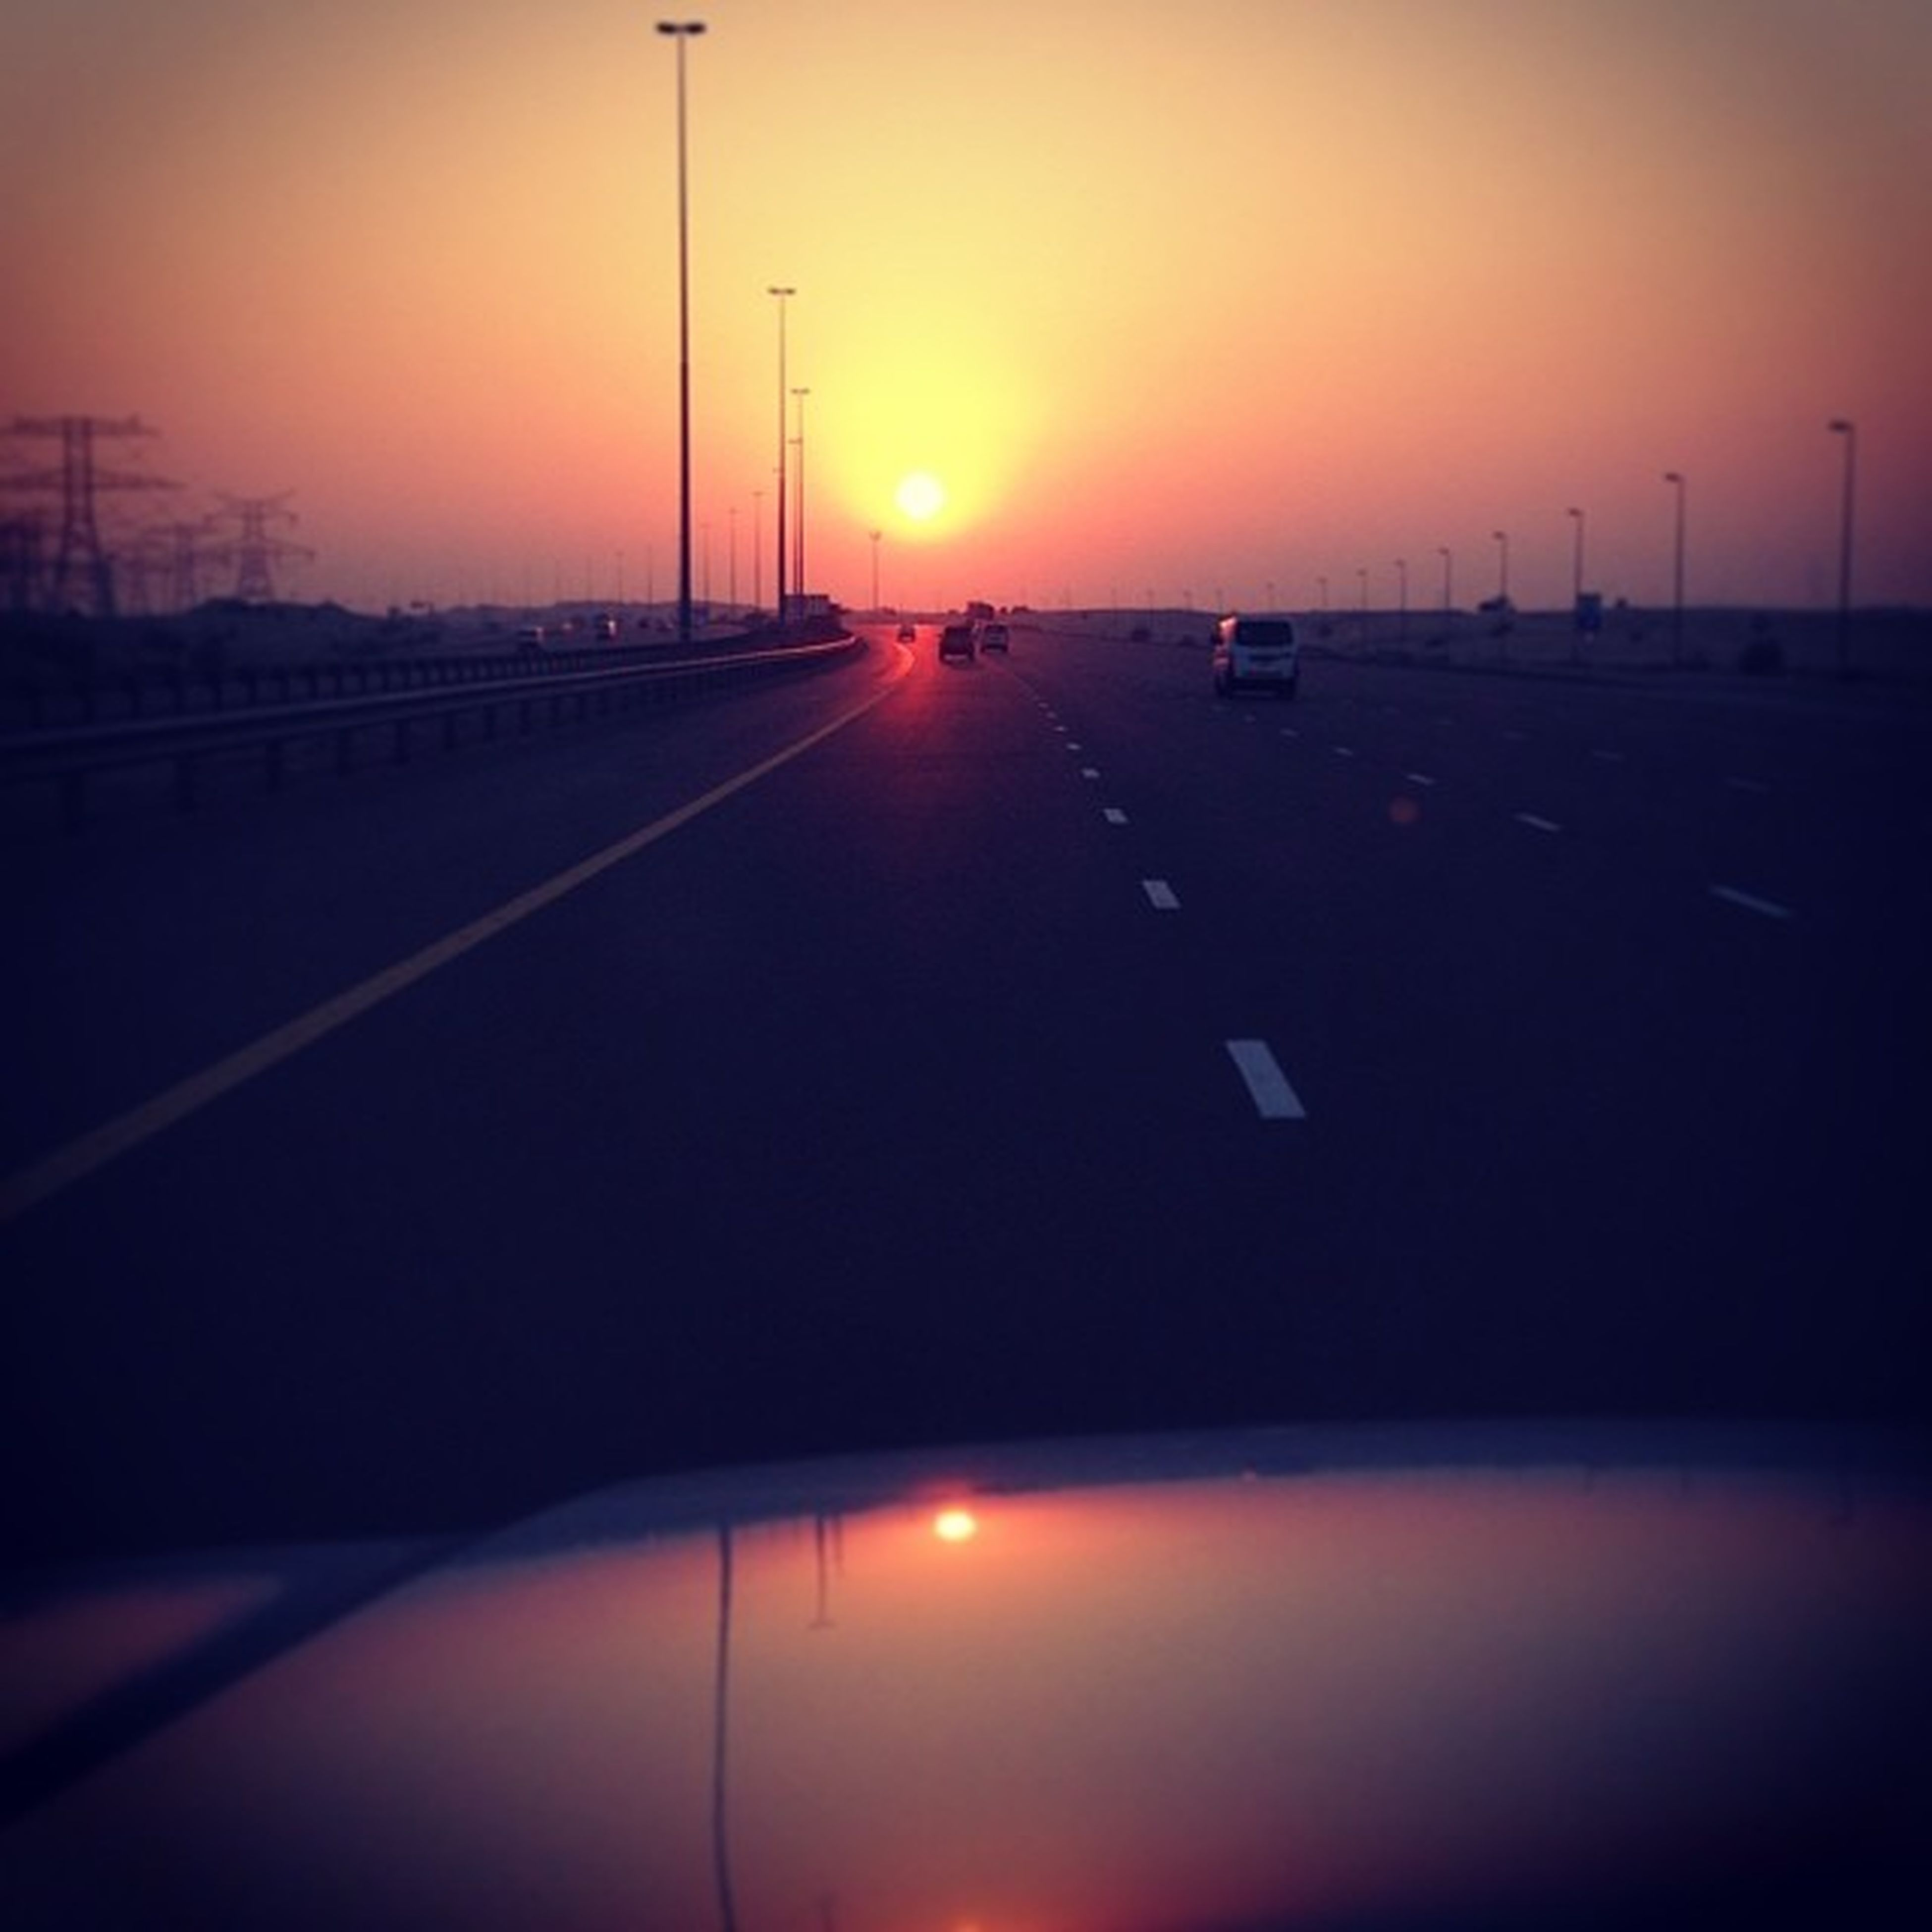 sunset, transportation, sun, orange color, mode of transport, silhouette, car, the way forward, road, sky, street light, diminishing perspective, land vehicle, sunlight, lens flare, travel, sunbeam, vanishing point, road marking, no people